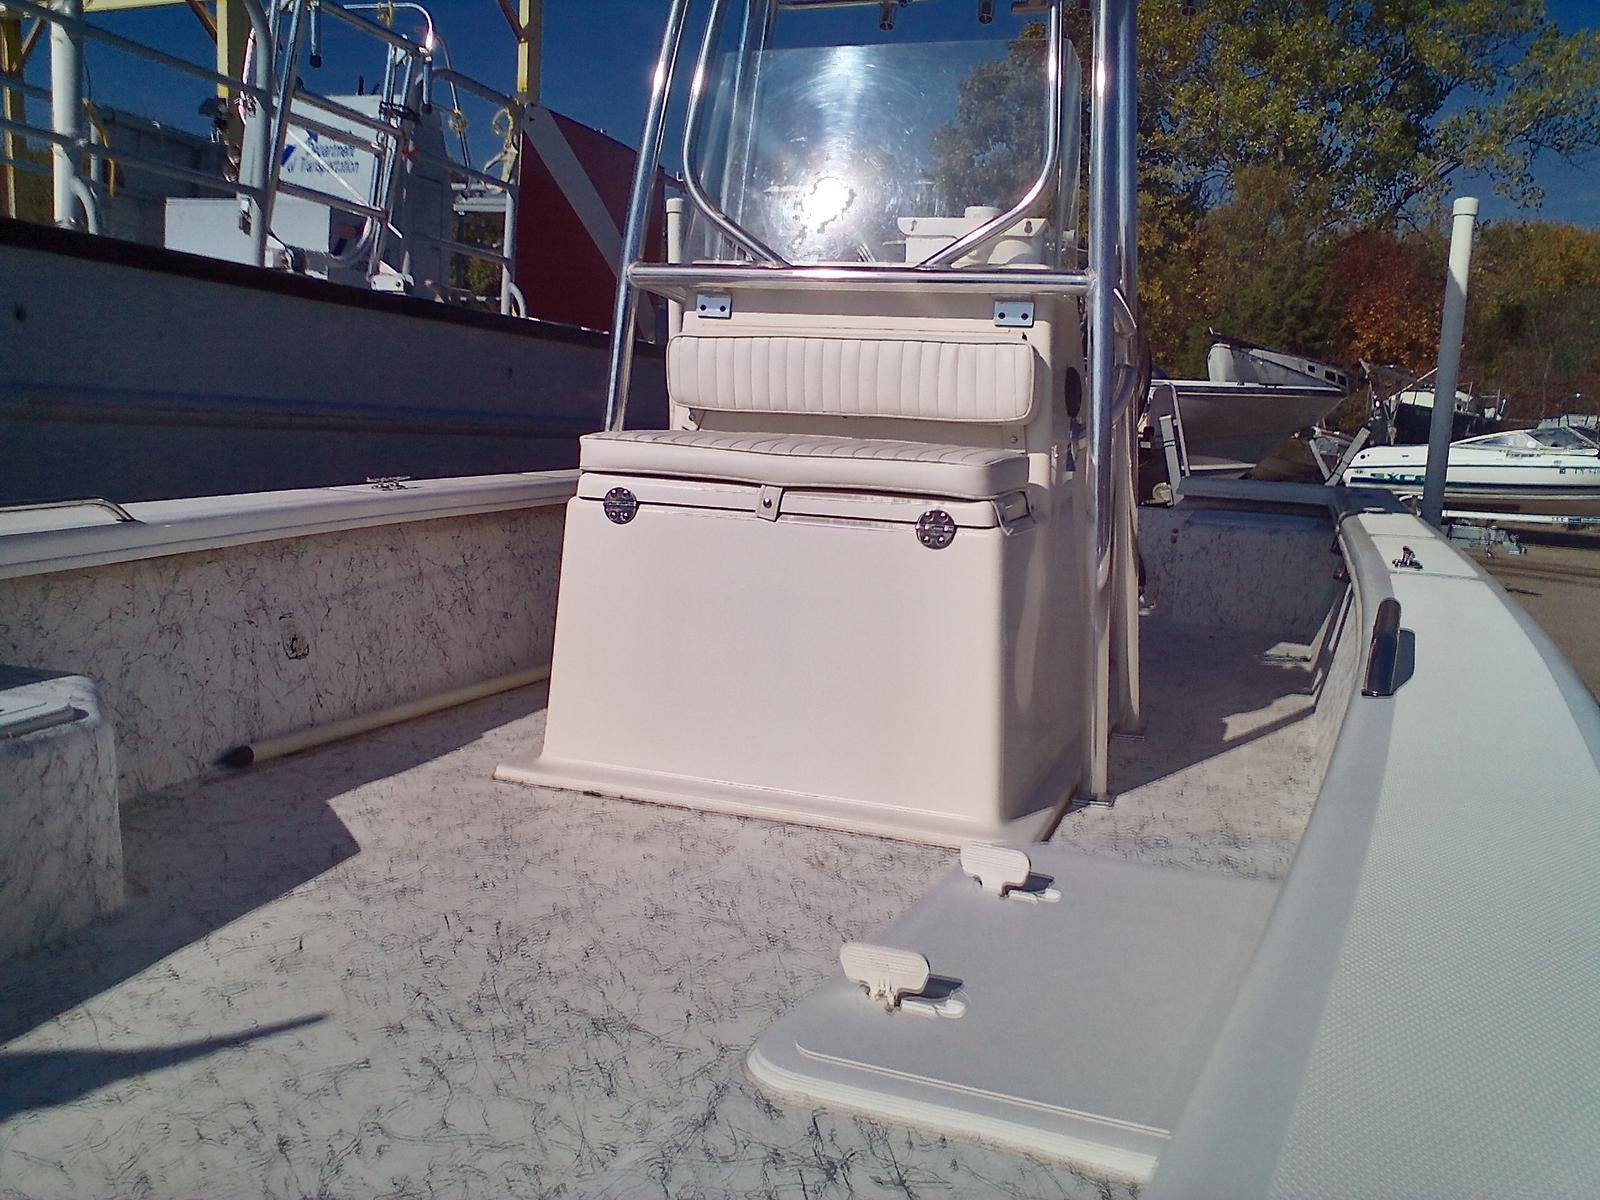 2008 Riddick boat for sale, model of the boat is Bay Runner 2290 & Image # 5 of 6